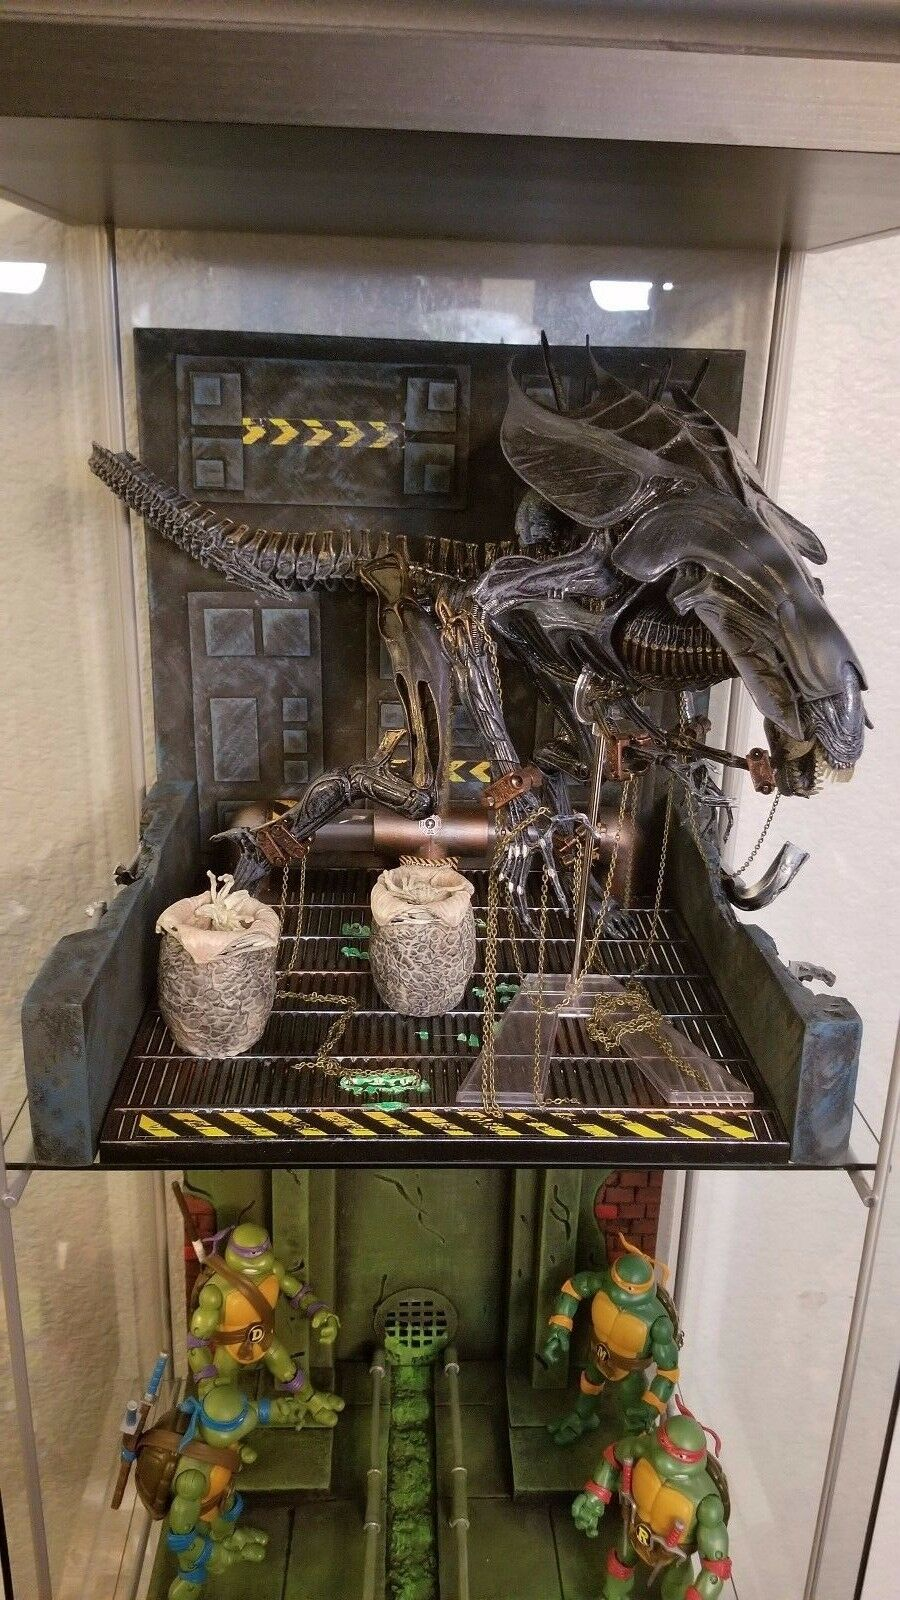 Xenowerx Alien Detolf Detolf Detolf Diorama Stand AVP Predator Neca Xenomorph 3c5912